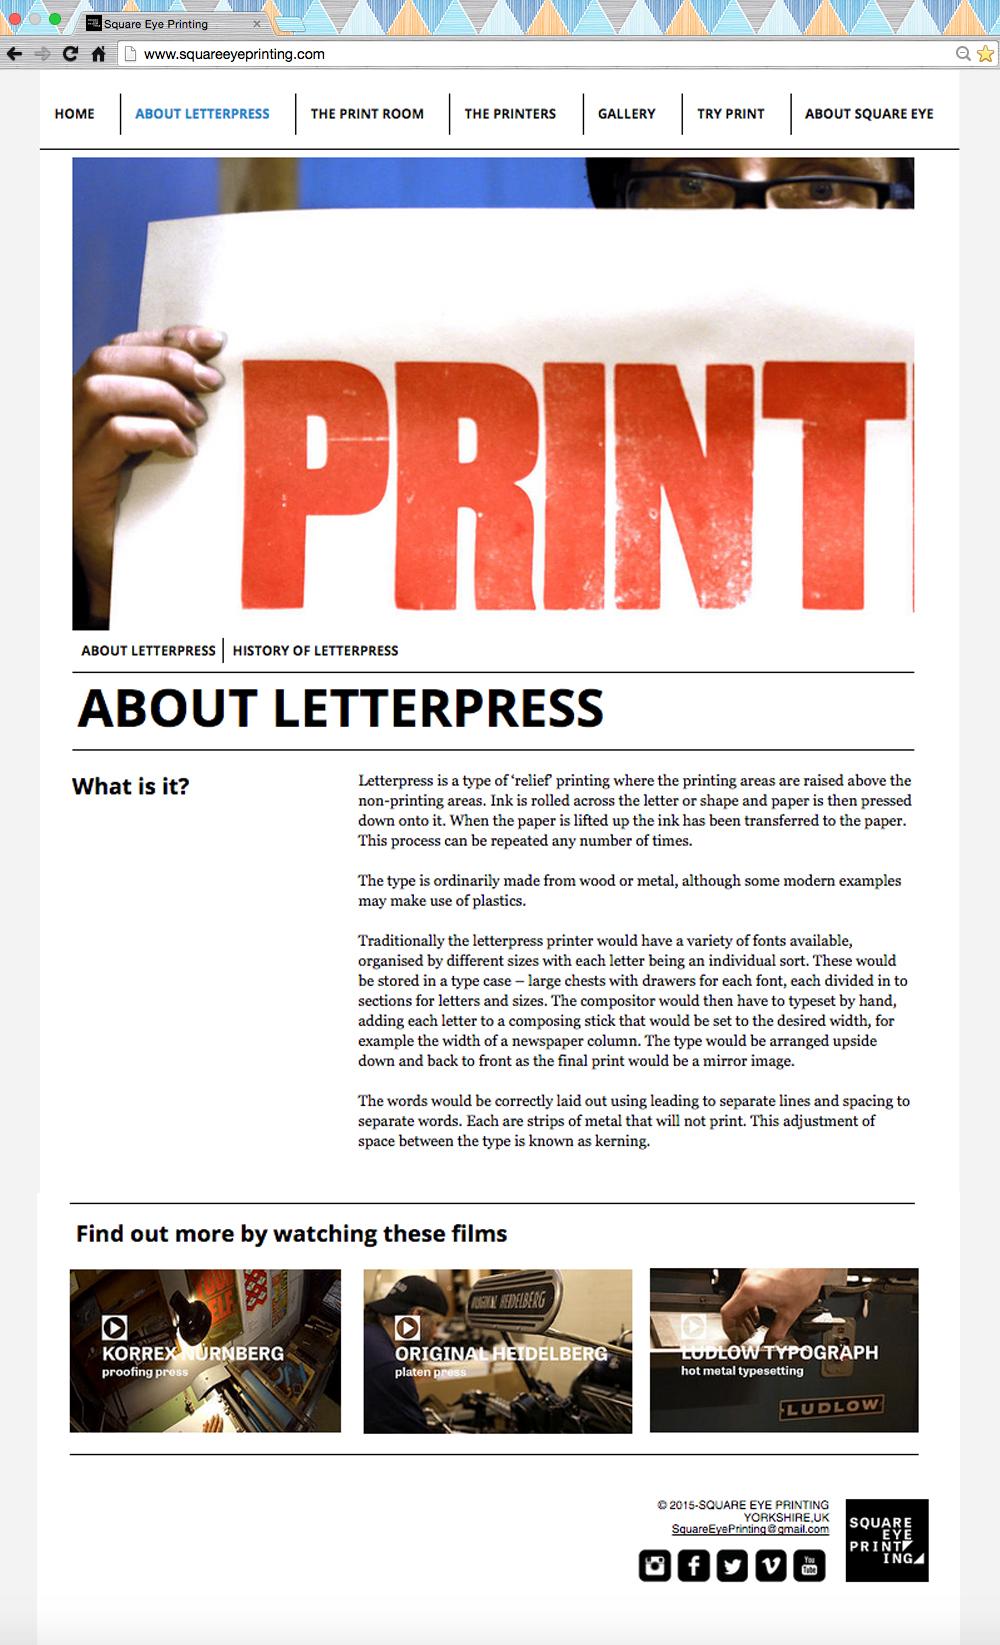 letterpress Documentary  Audience development Square Eye Printing yorkshire printmaking printer video content digital